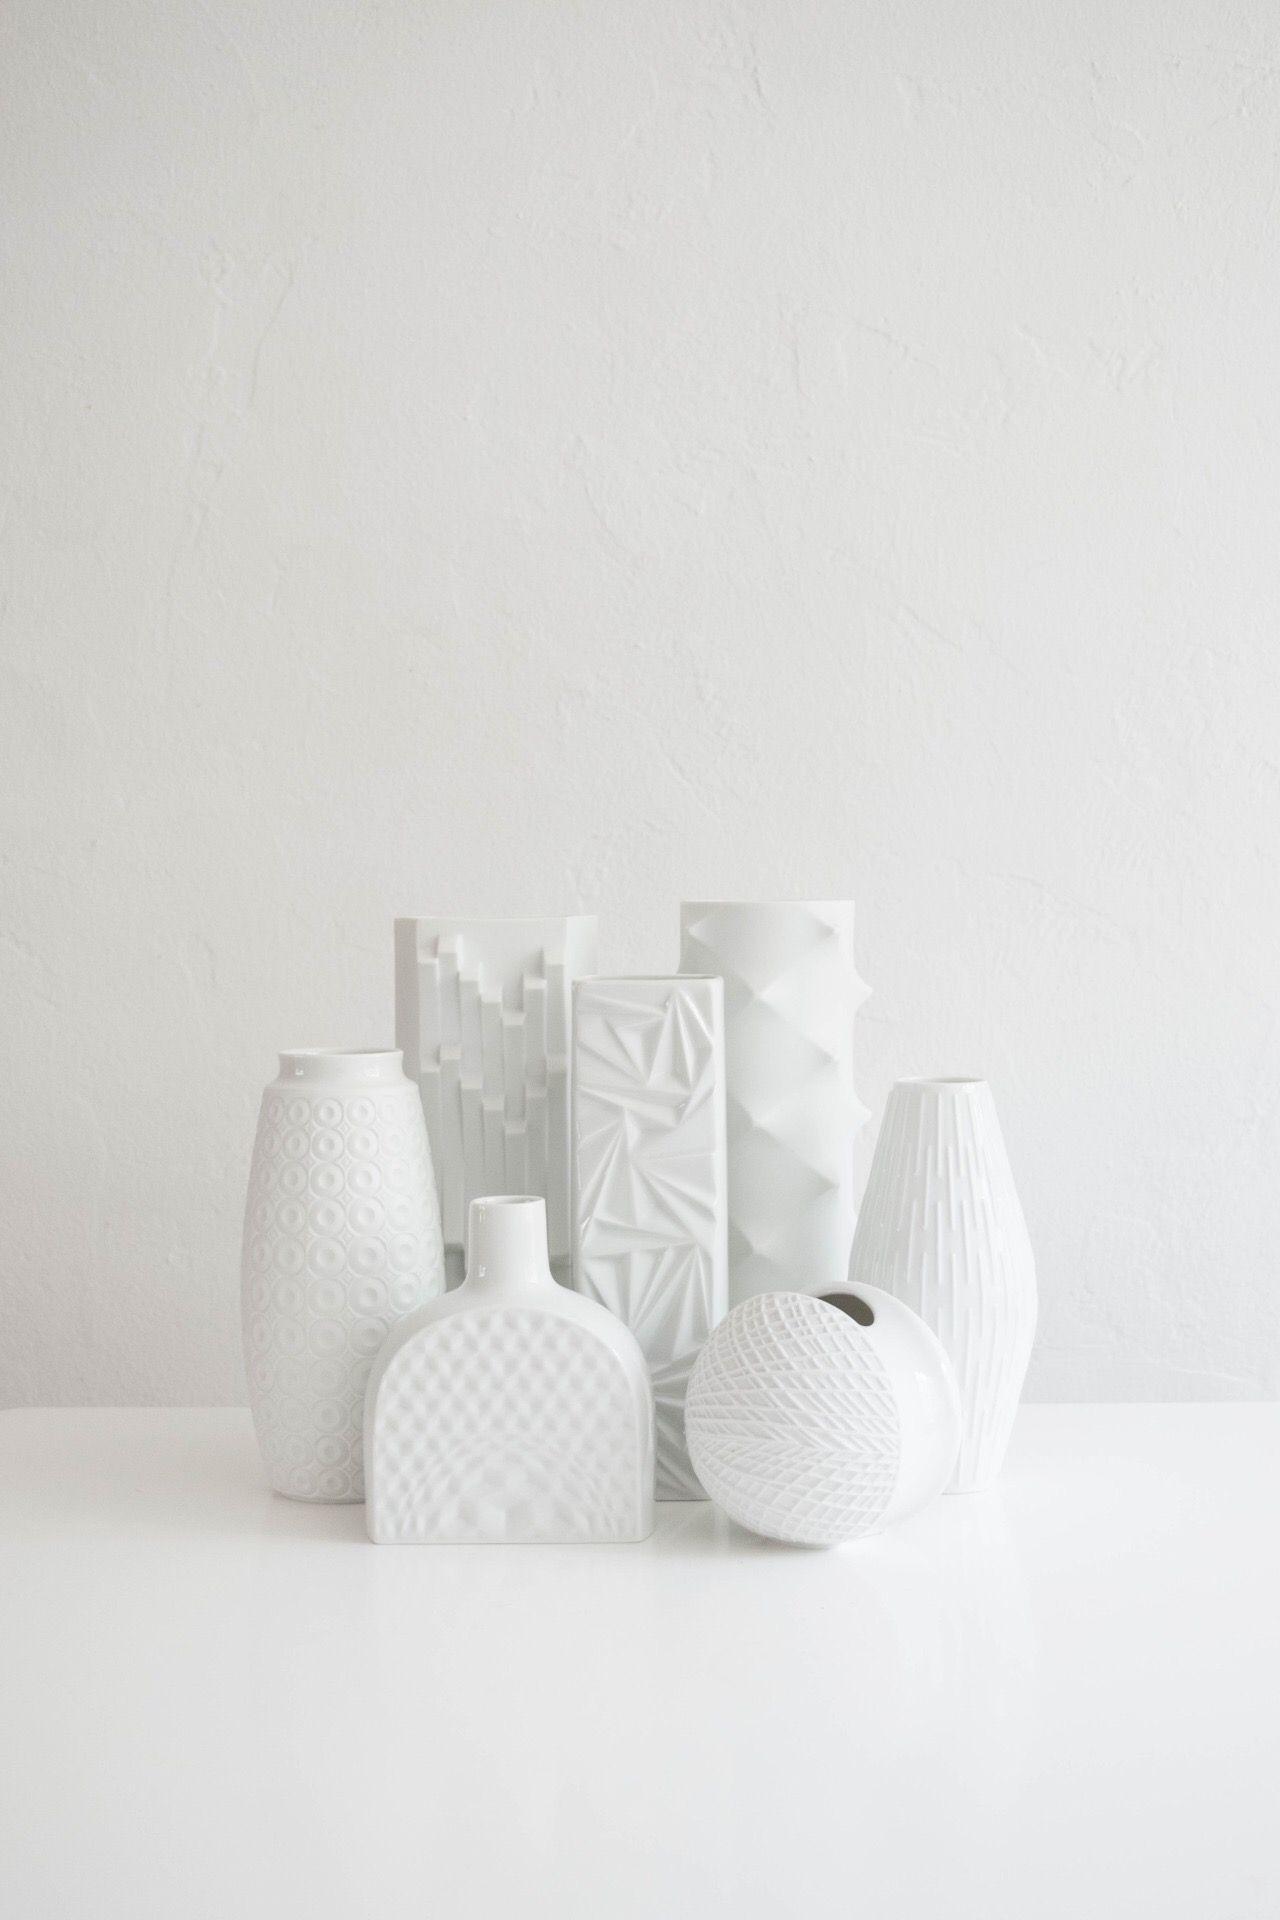 Mid Century Modern White Porcelain Vase Collection